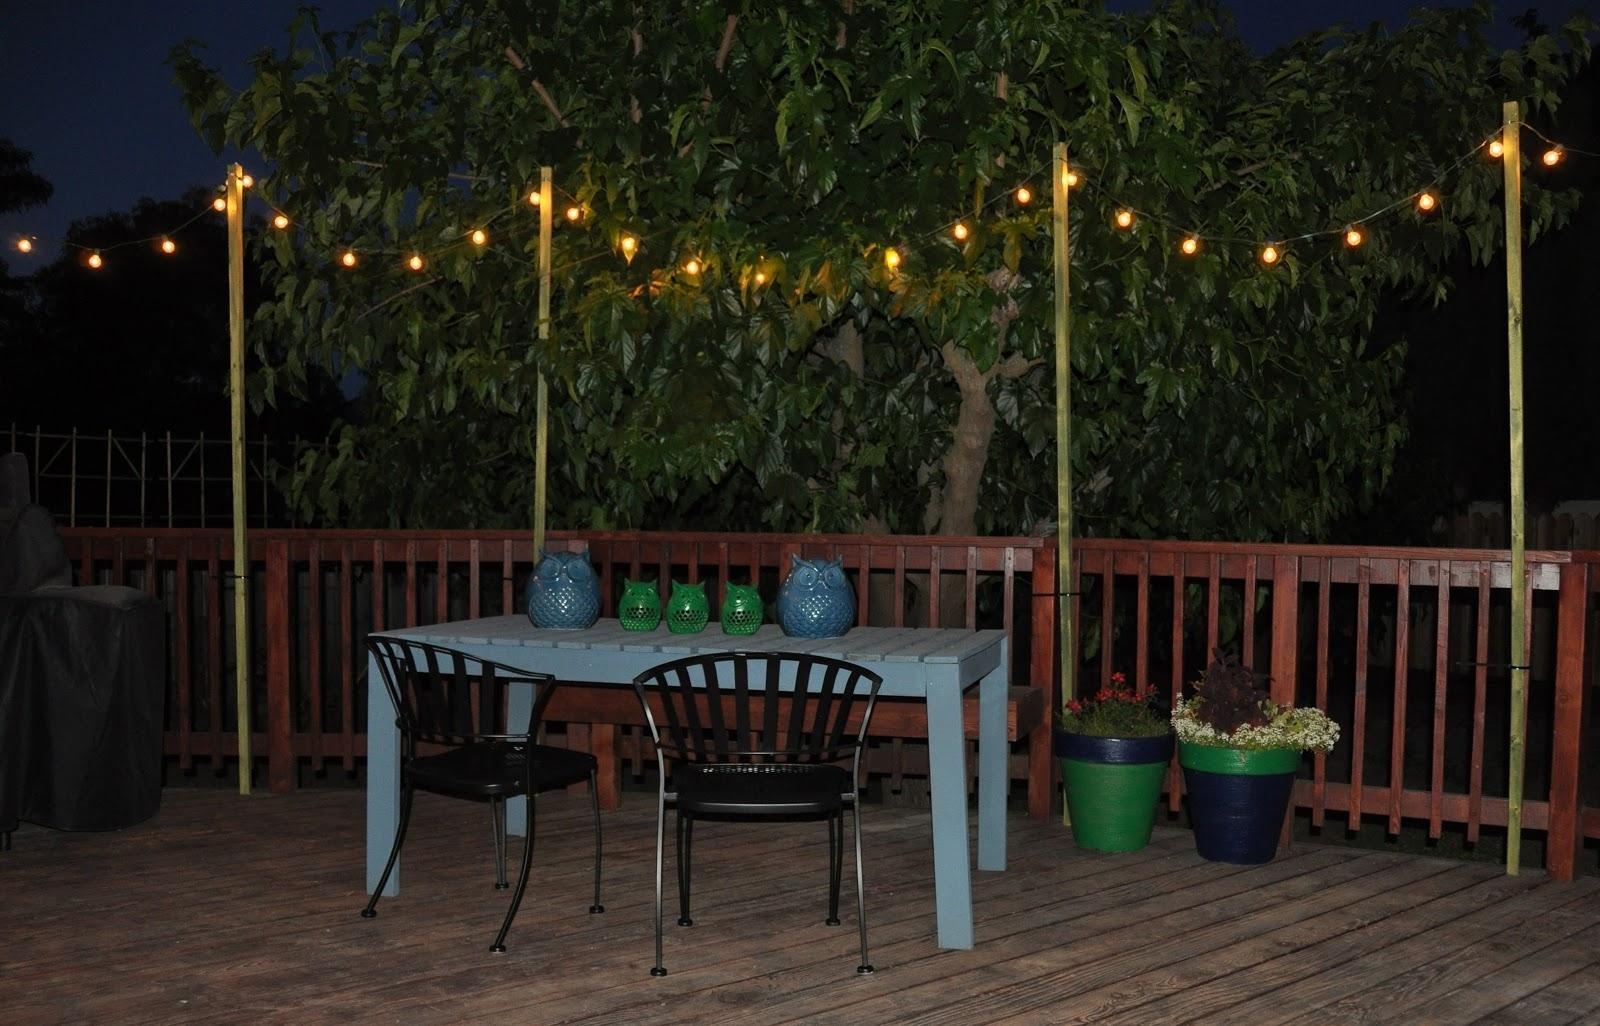 Trendy Outdoor Patio Hanging String Lights Pertaining To How To Hang String Lights Outsidehanging Outdoor Patio Lights On (View 20 of 20)